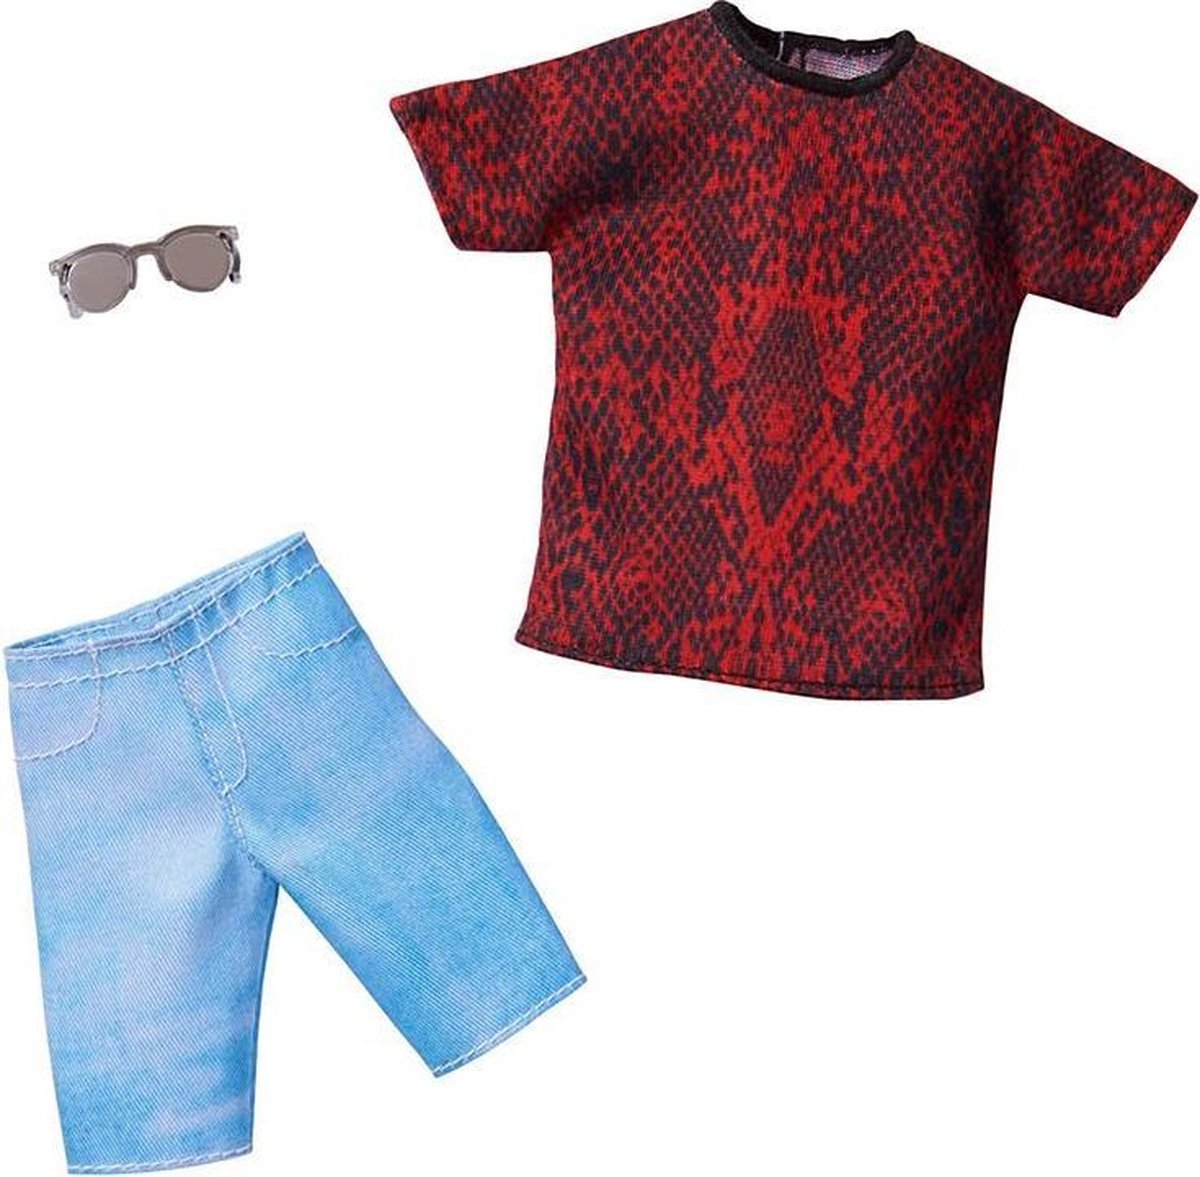 Barbie Ken poppenkleding met rood en zwart T-shirt, korte broek en 1 accessoire